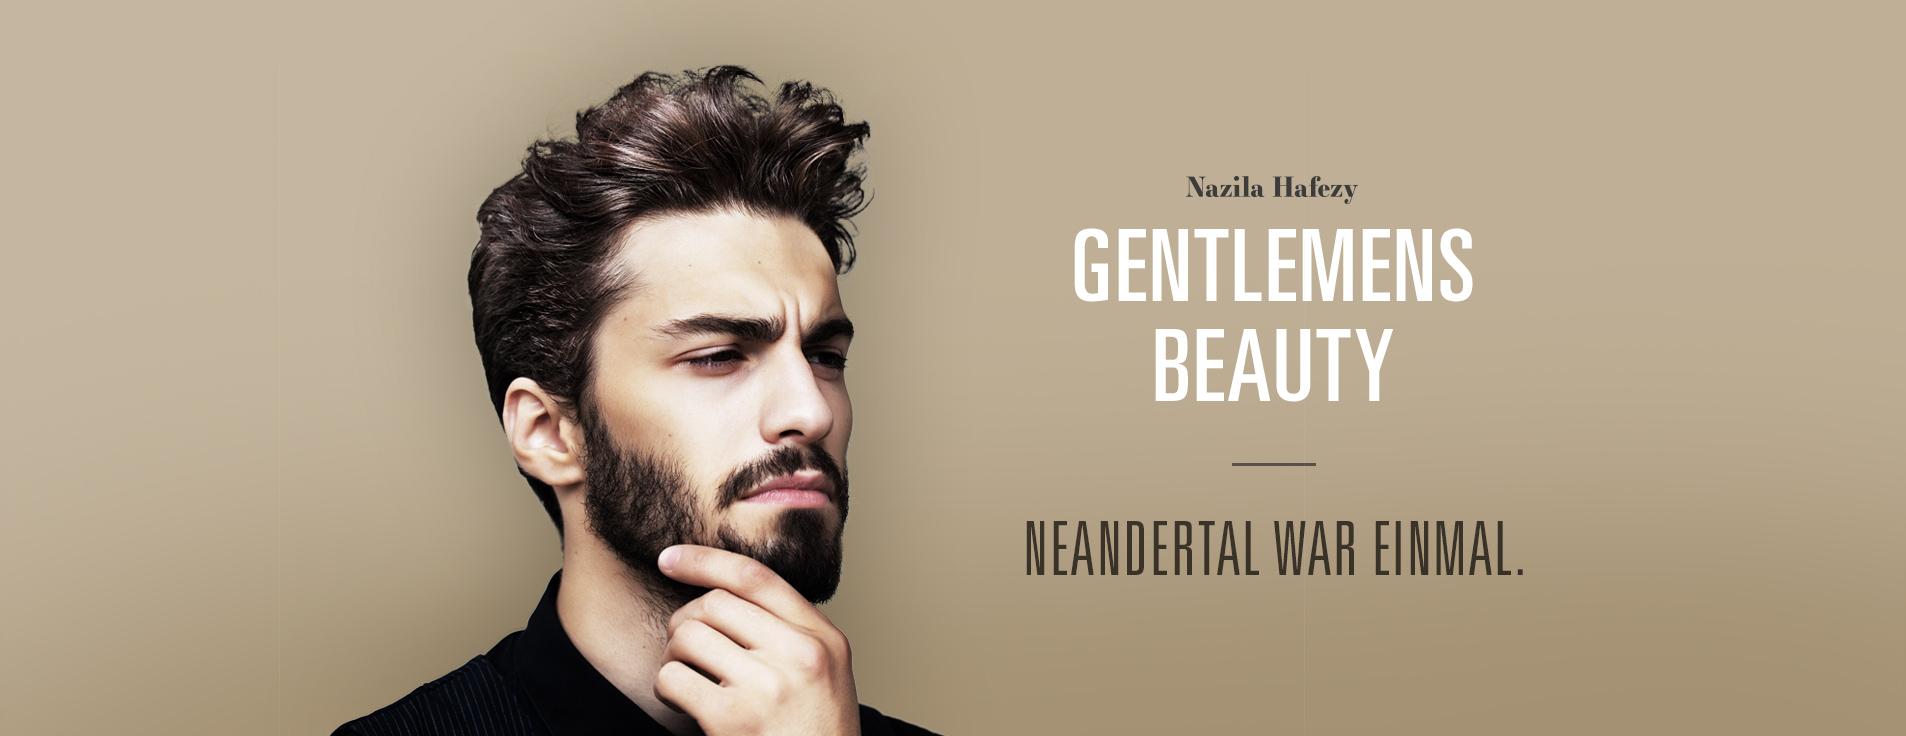 Gentlemensbeauty - Neandertal war einmal - Nazila Hafezy - Hamburg